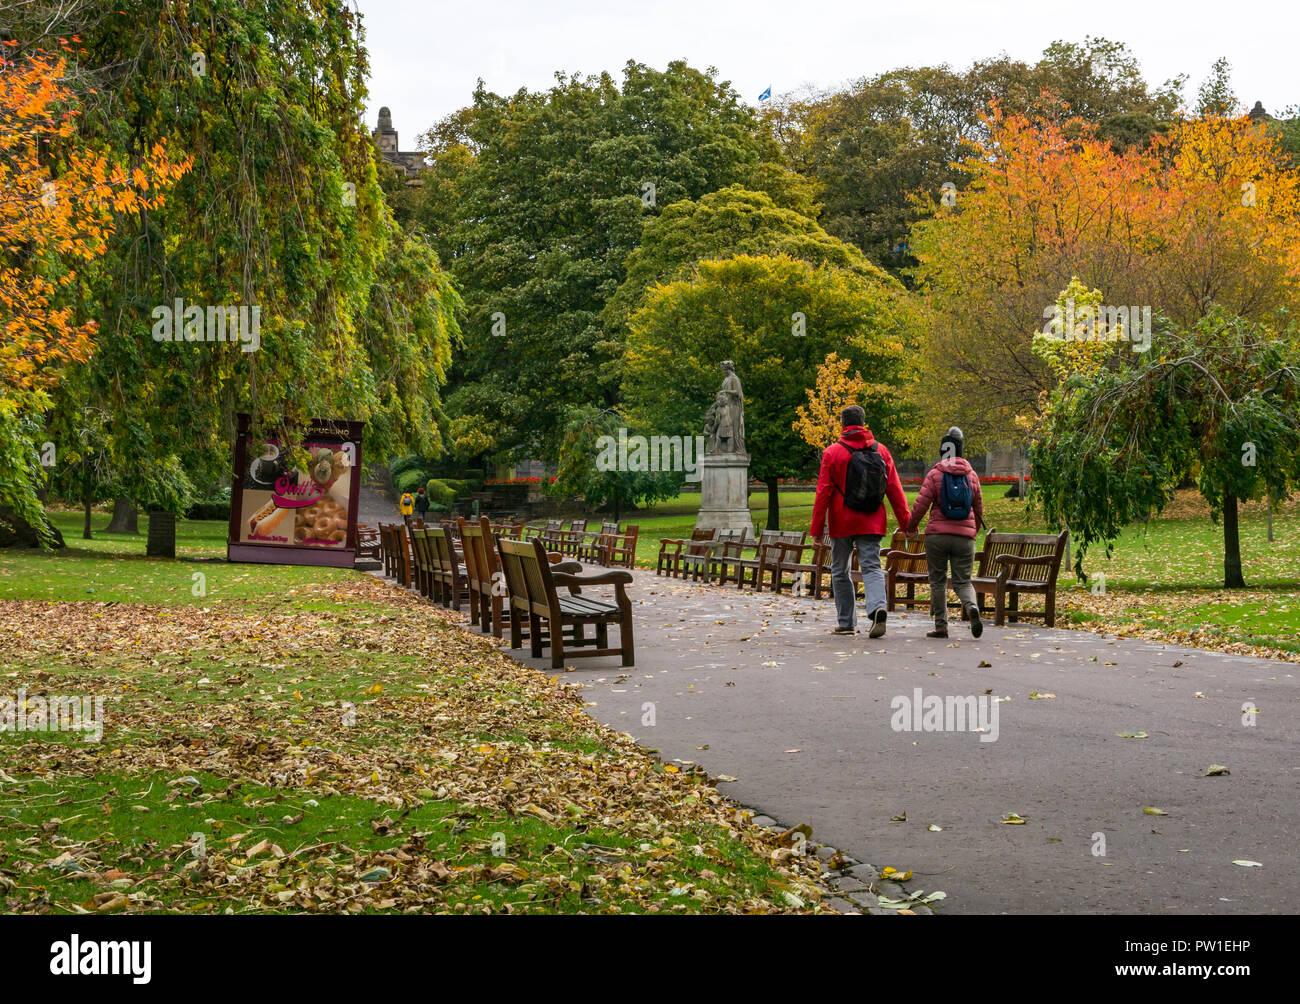 princes-street-gardens-edinburgh-scotlan